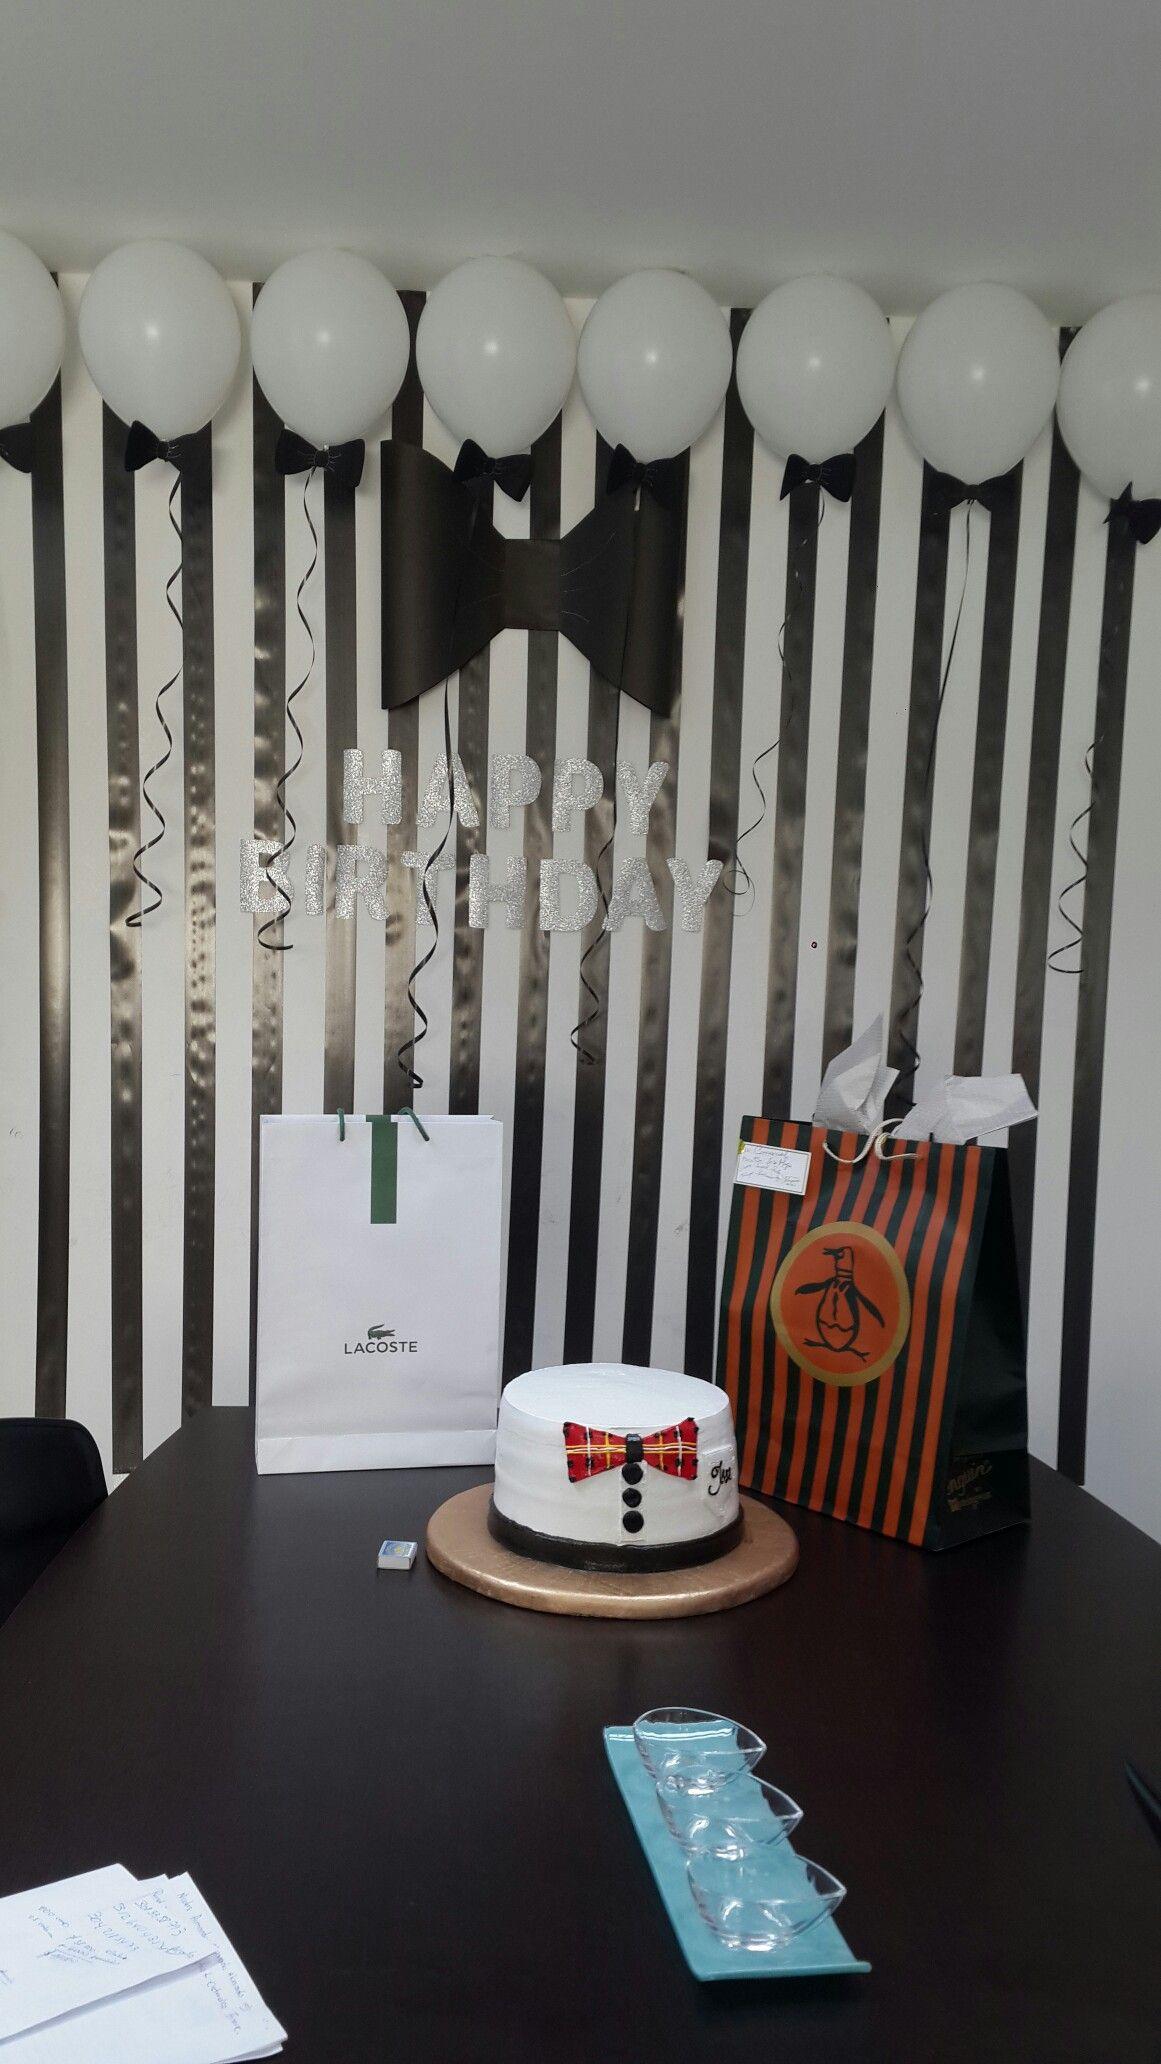 Decoracion cumplea os hombre creatividad decoraci n - Decoracion fiestas cumpleanos ...